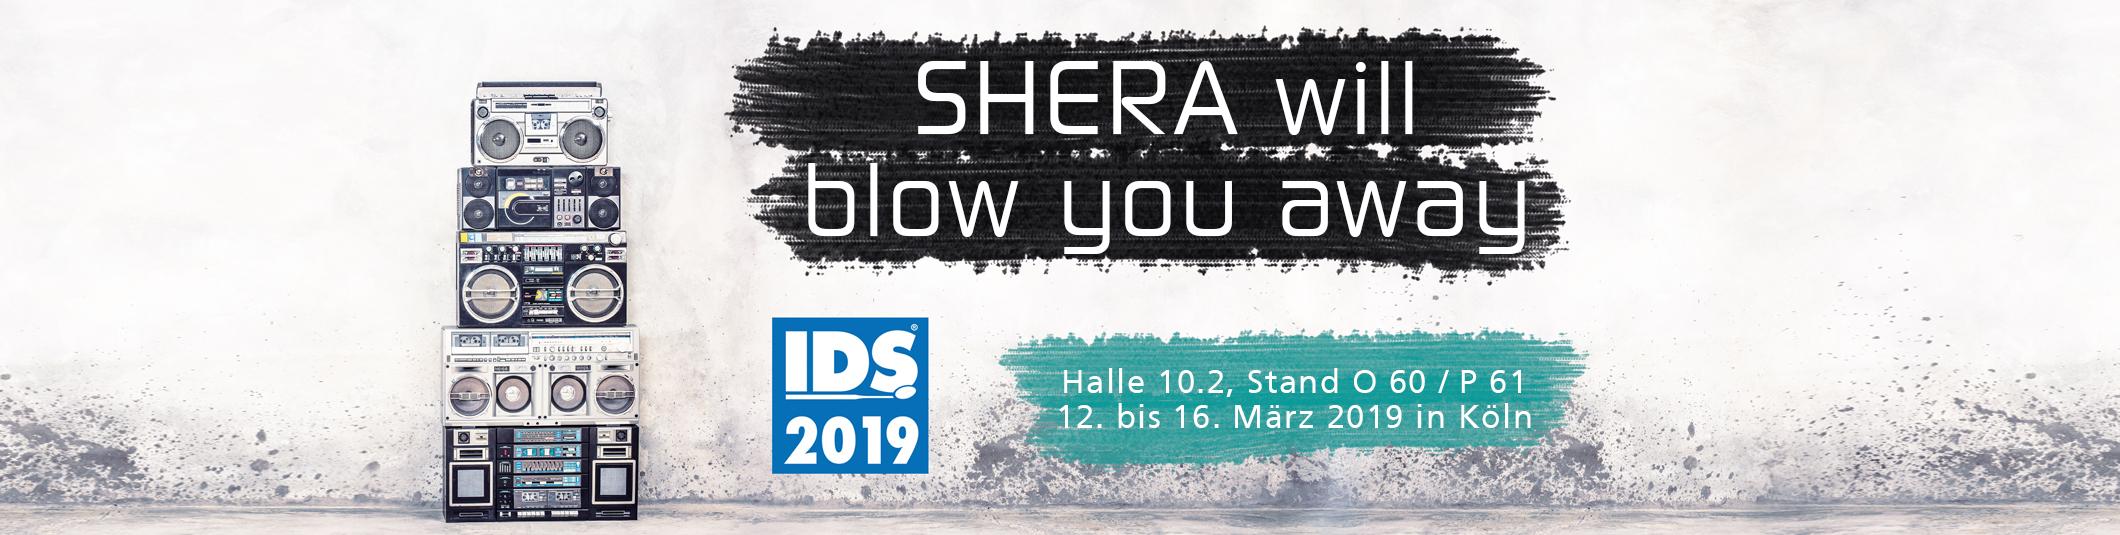 shera_slider_2019_ids_2